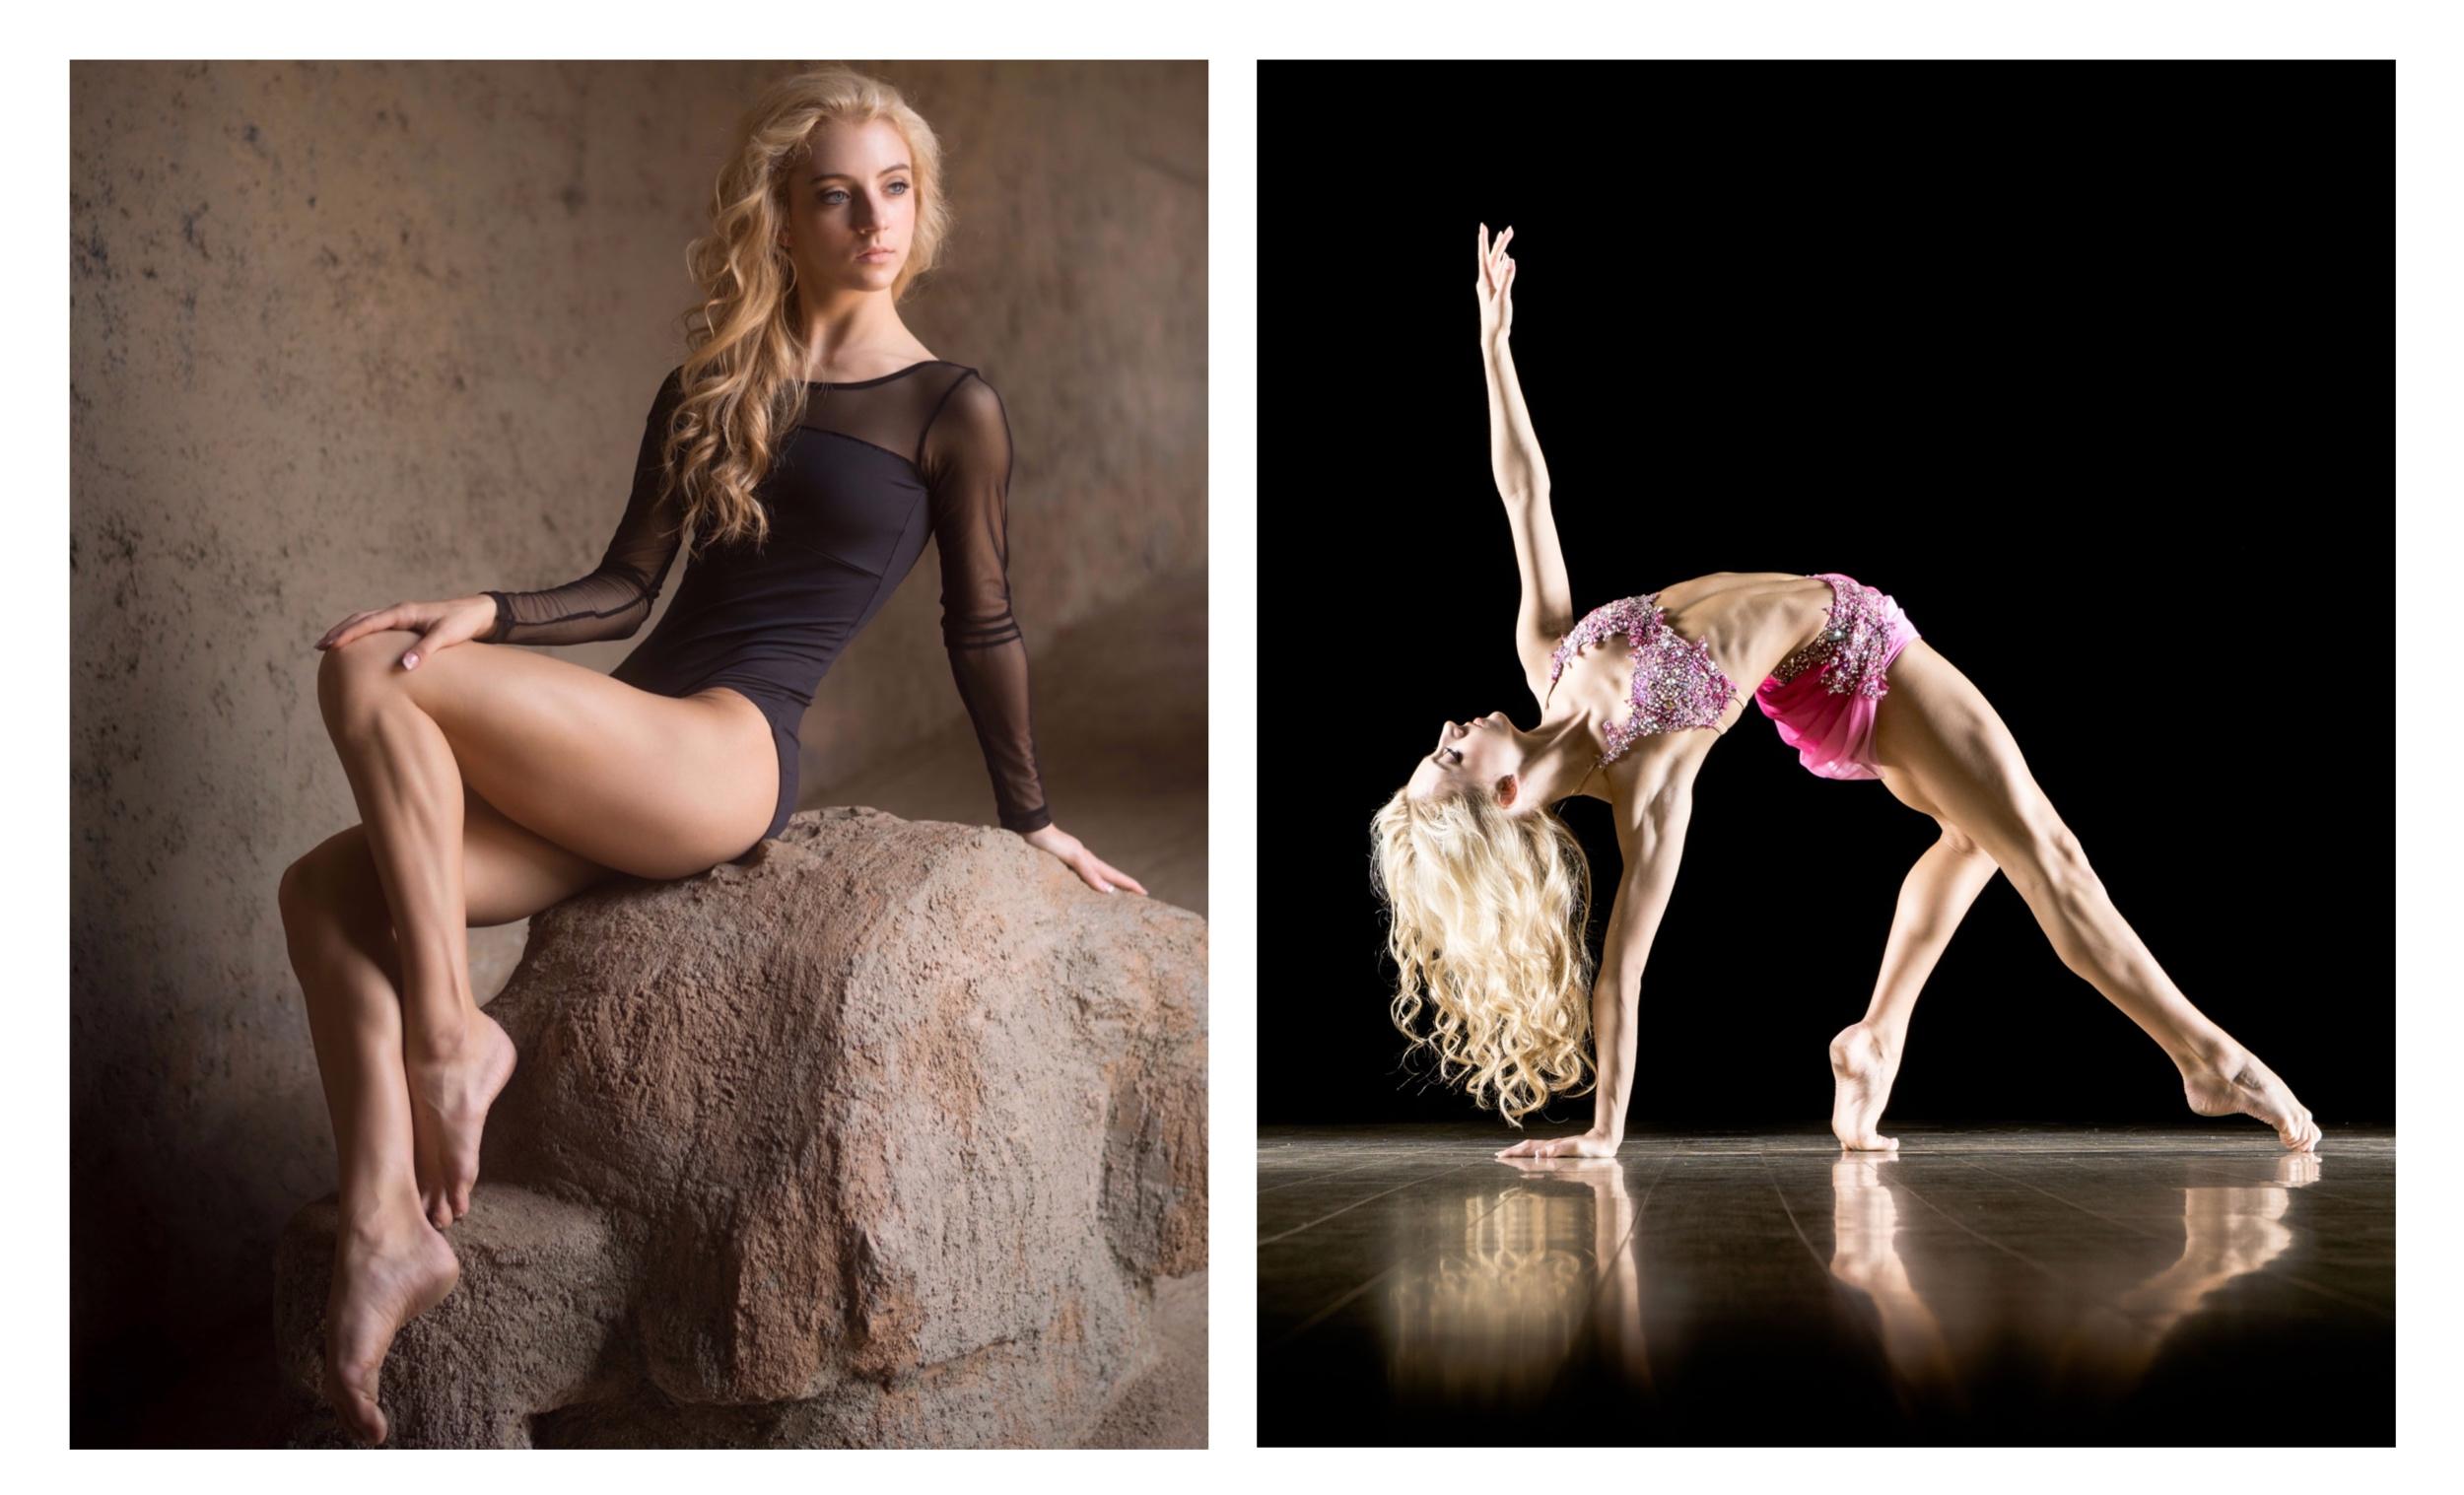 dancer gallery design 1 - view demo